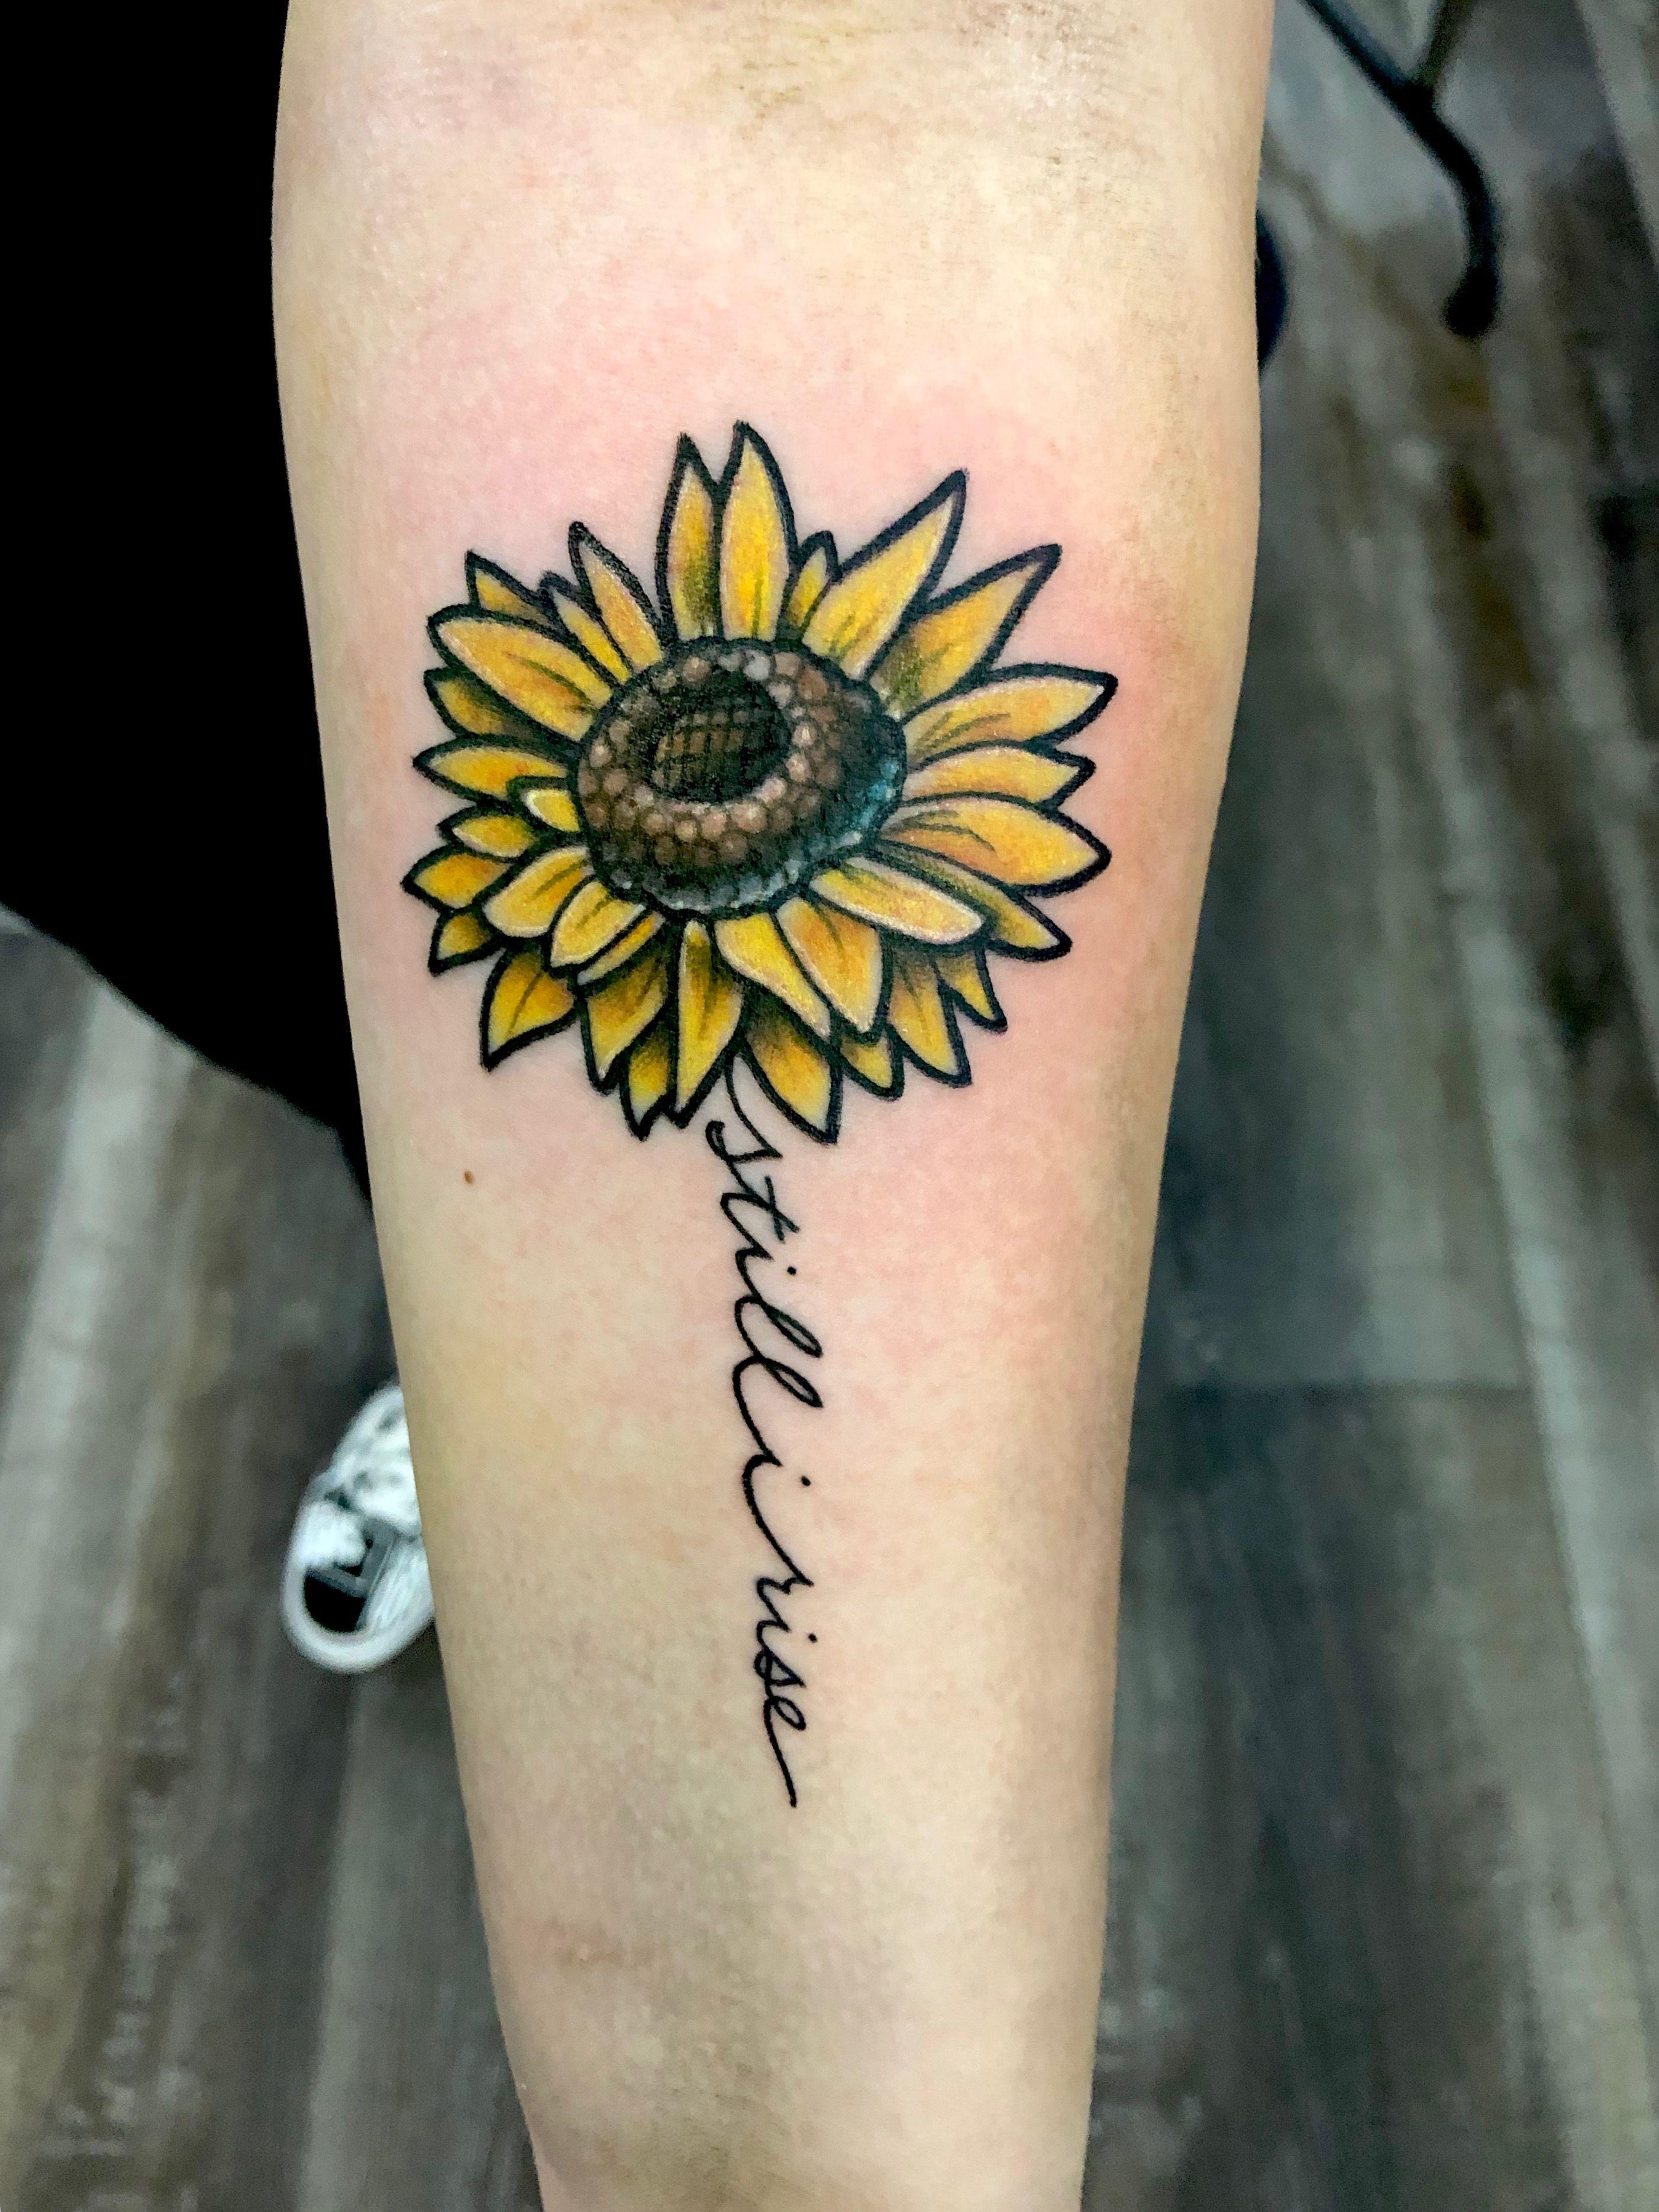 Still I Rise Sunflower Tattoo Chest Tattoos For Women Chest Piece Tattoos Fire Tattoo